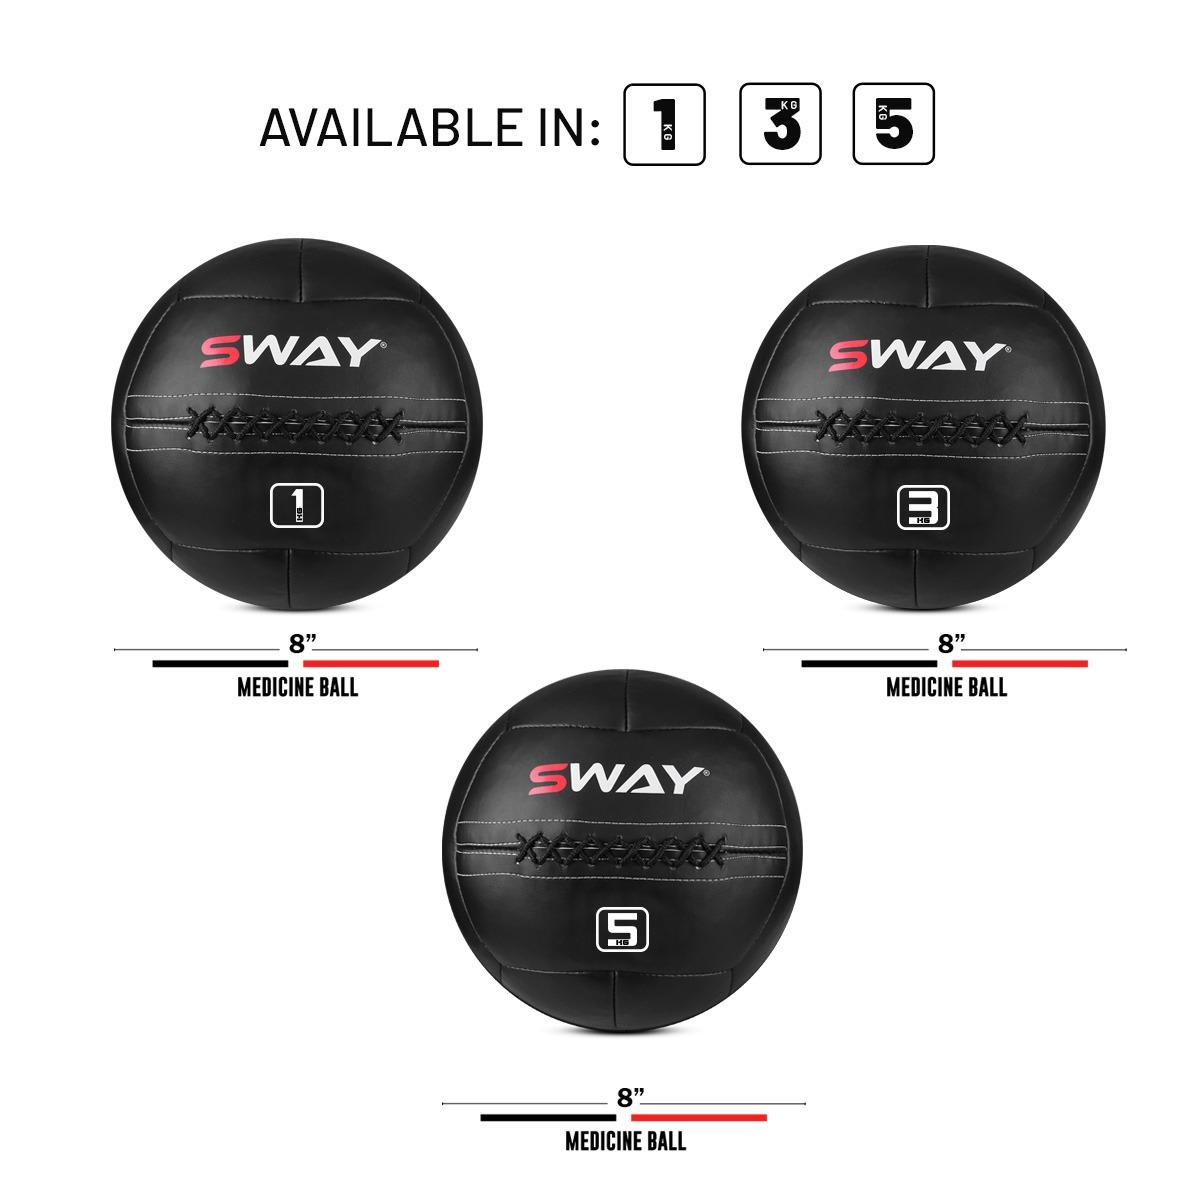 SWAY MEDICINE BALL (8''), SLAM BALL BLUE BLACK, WALL BALL, MEDICINE BALLS, CORE STRENGTH, FITNESS, HEAVY WORKOUT, WORKOUT BALLS, WEIGHTED BALLS, STRENGTH TRAINING EQUIPMENTS